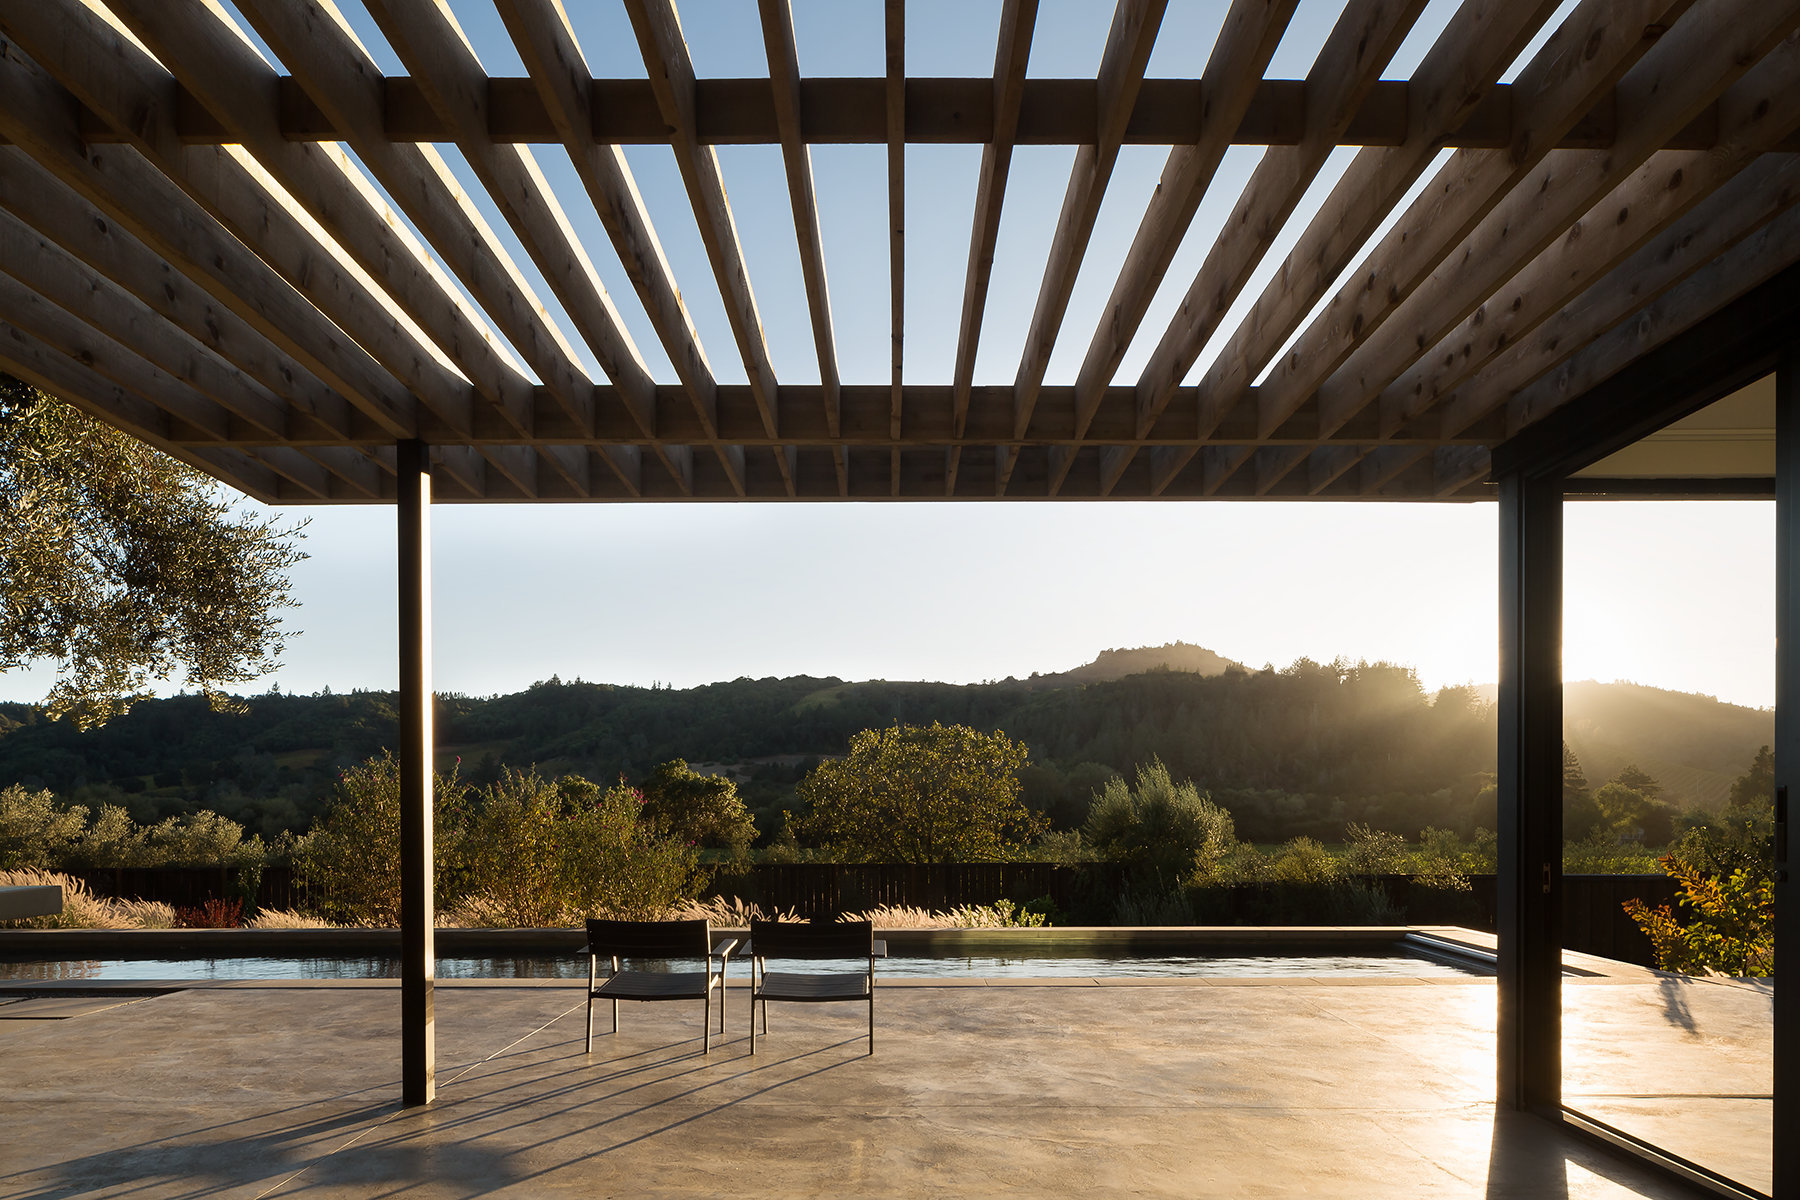 RoRockett-PoolHouse-5067.tif